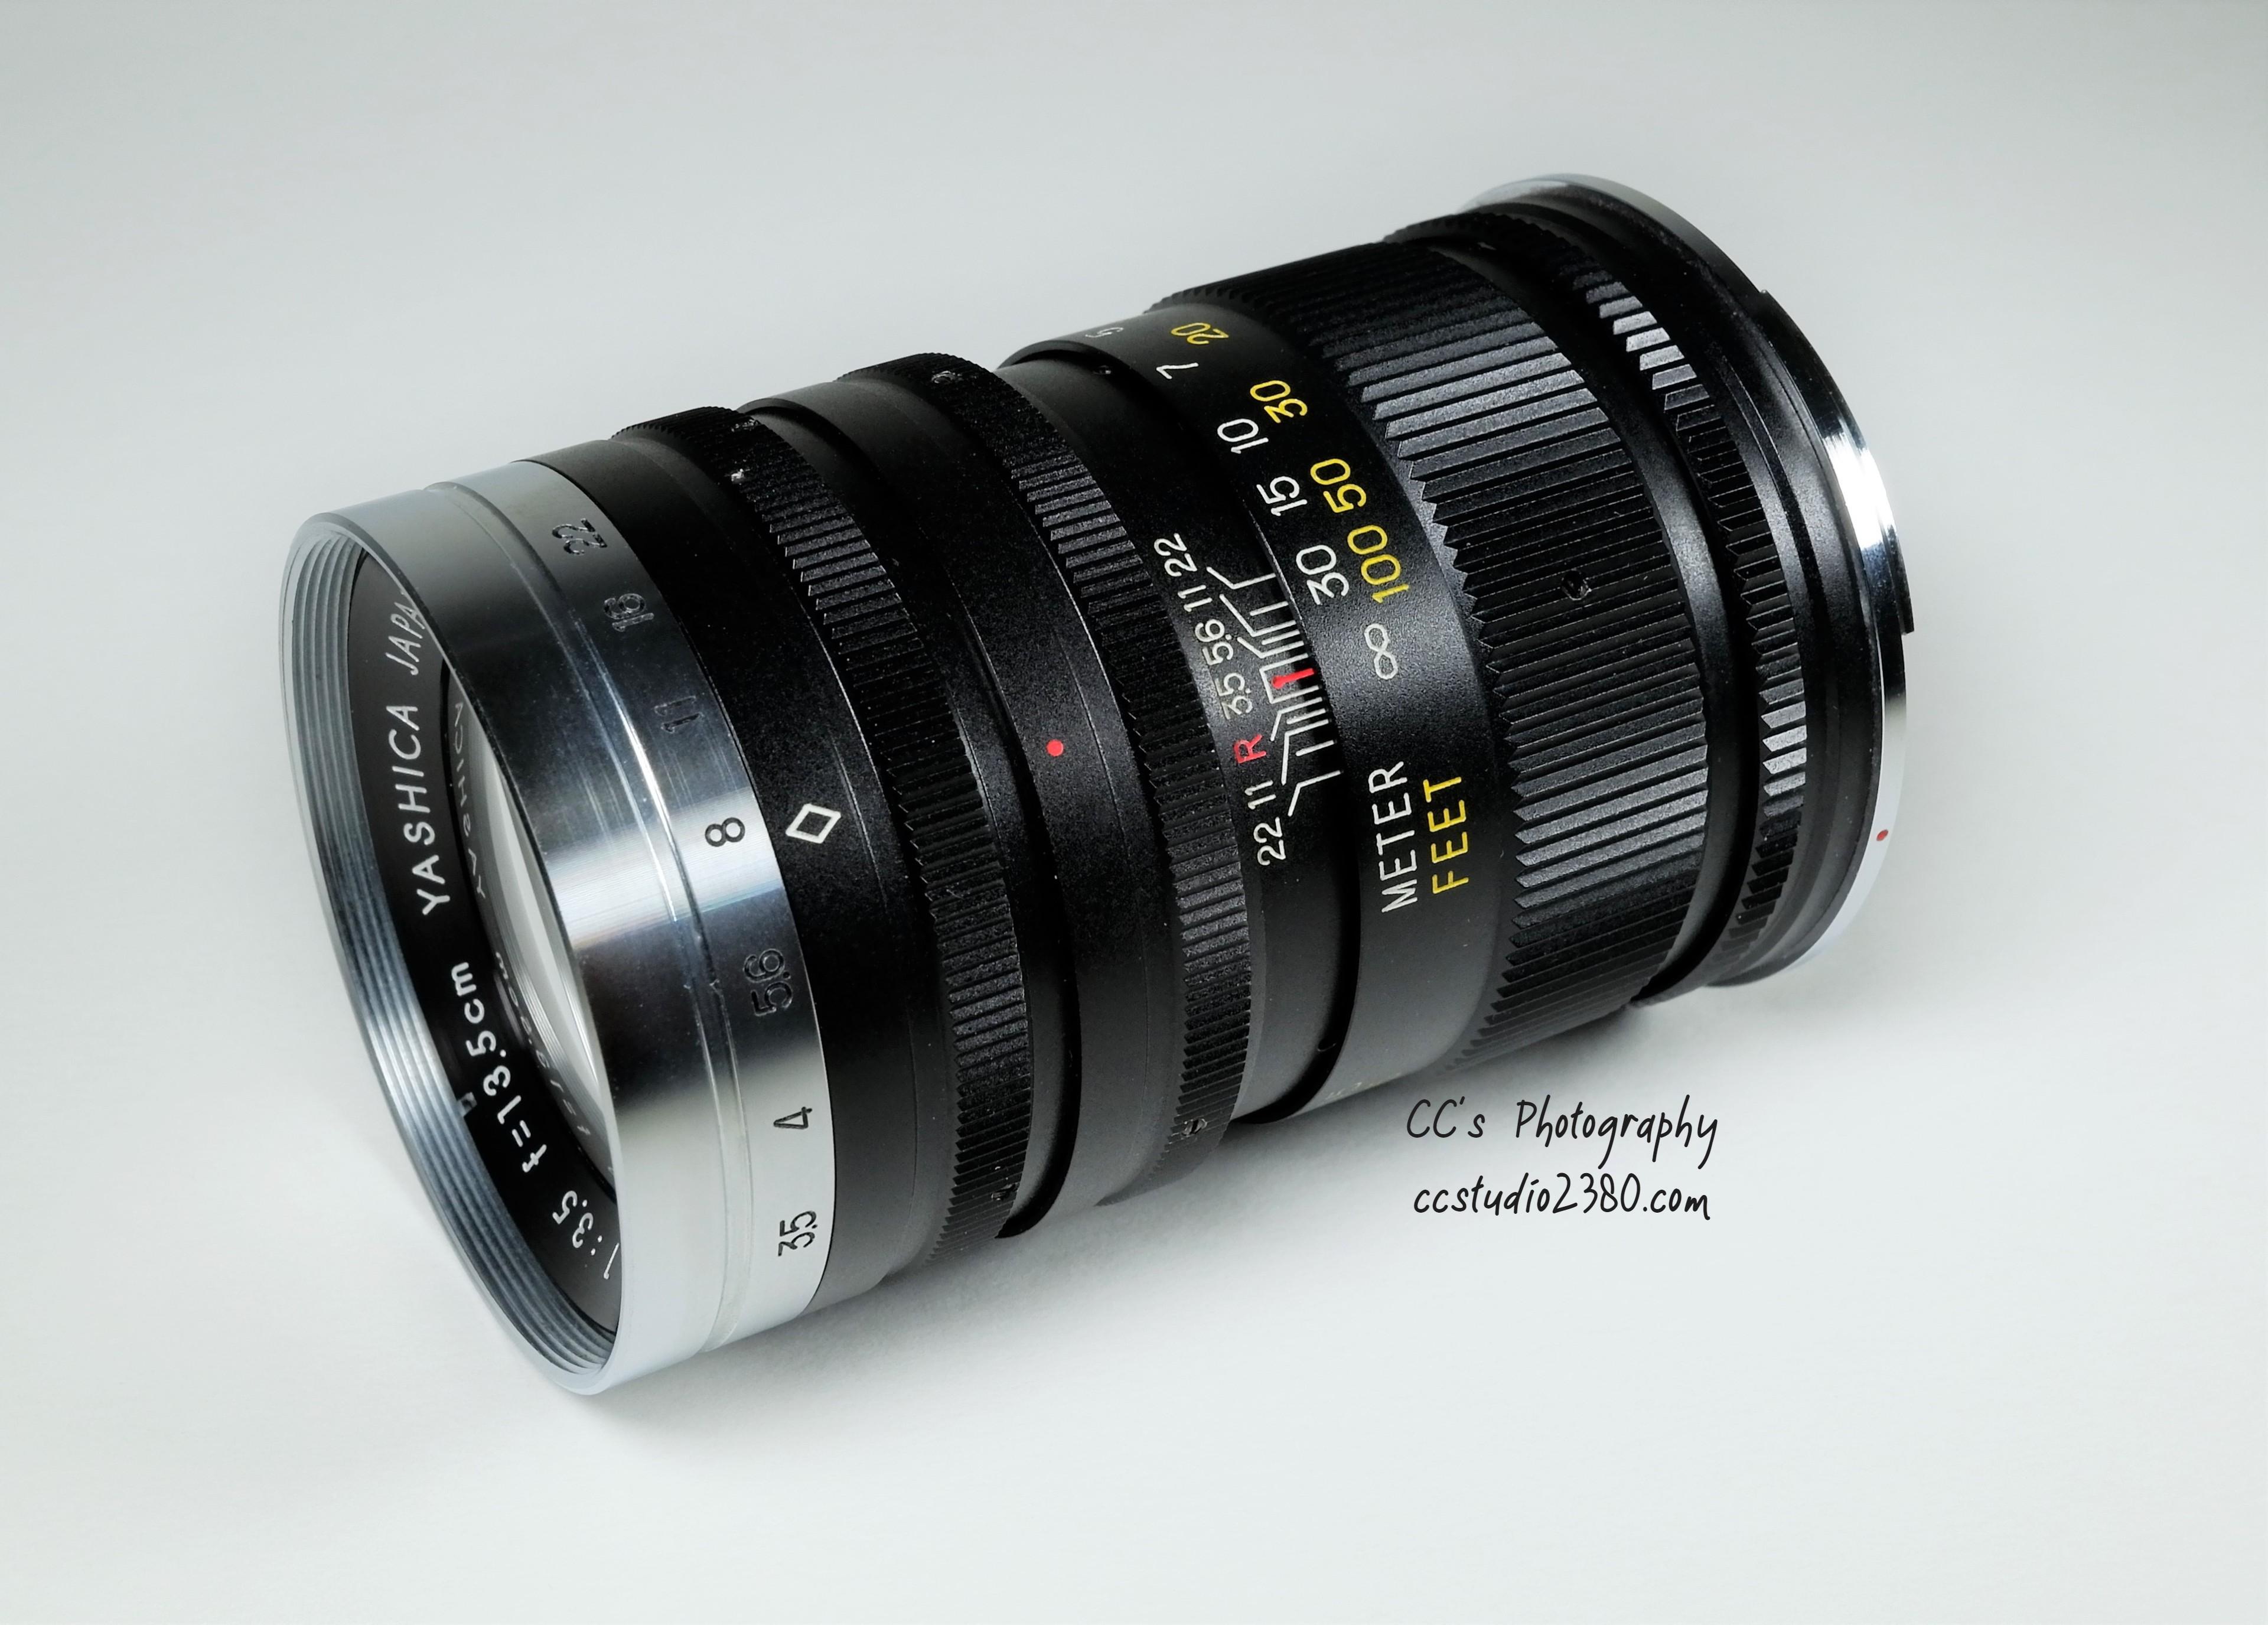 yashica 13.5 lens with logo